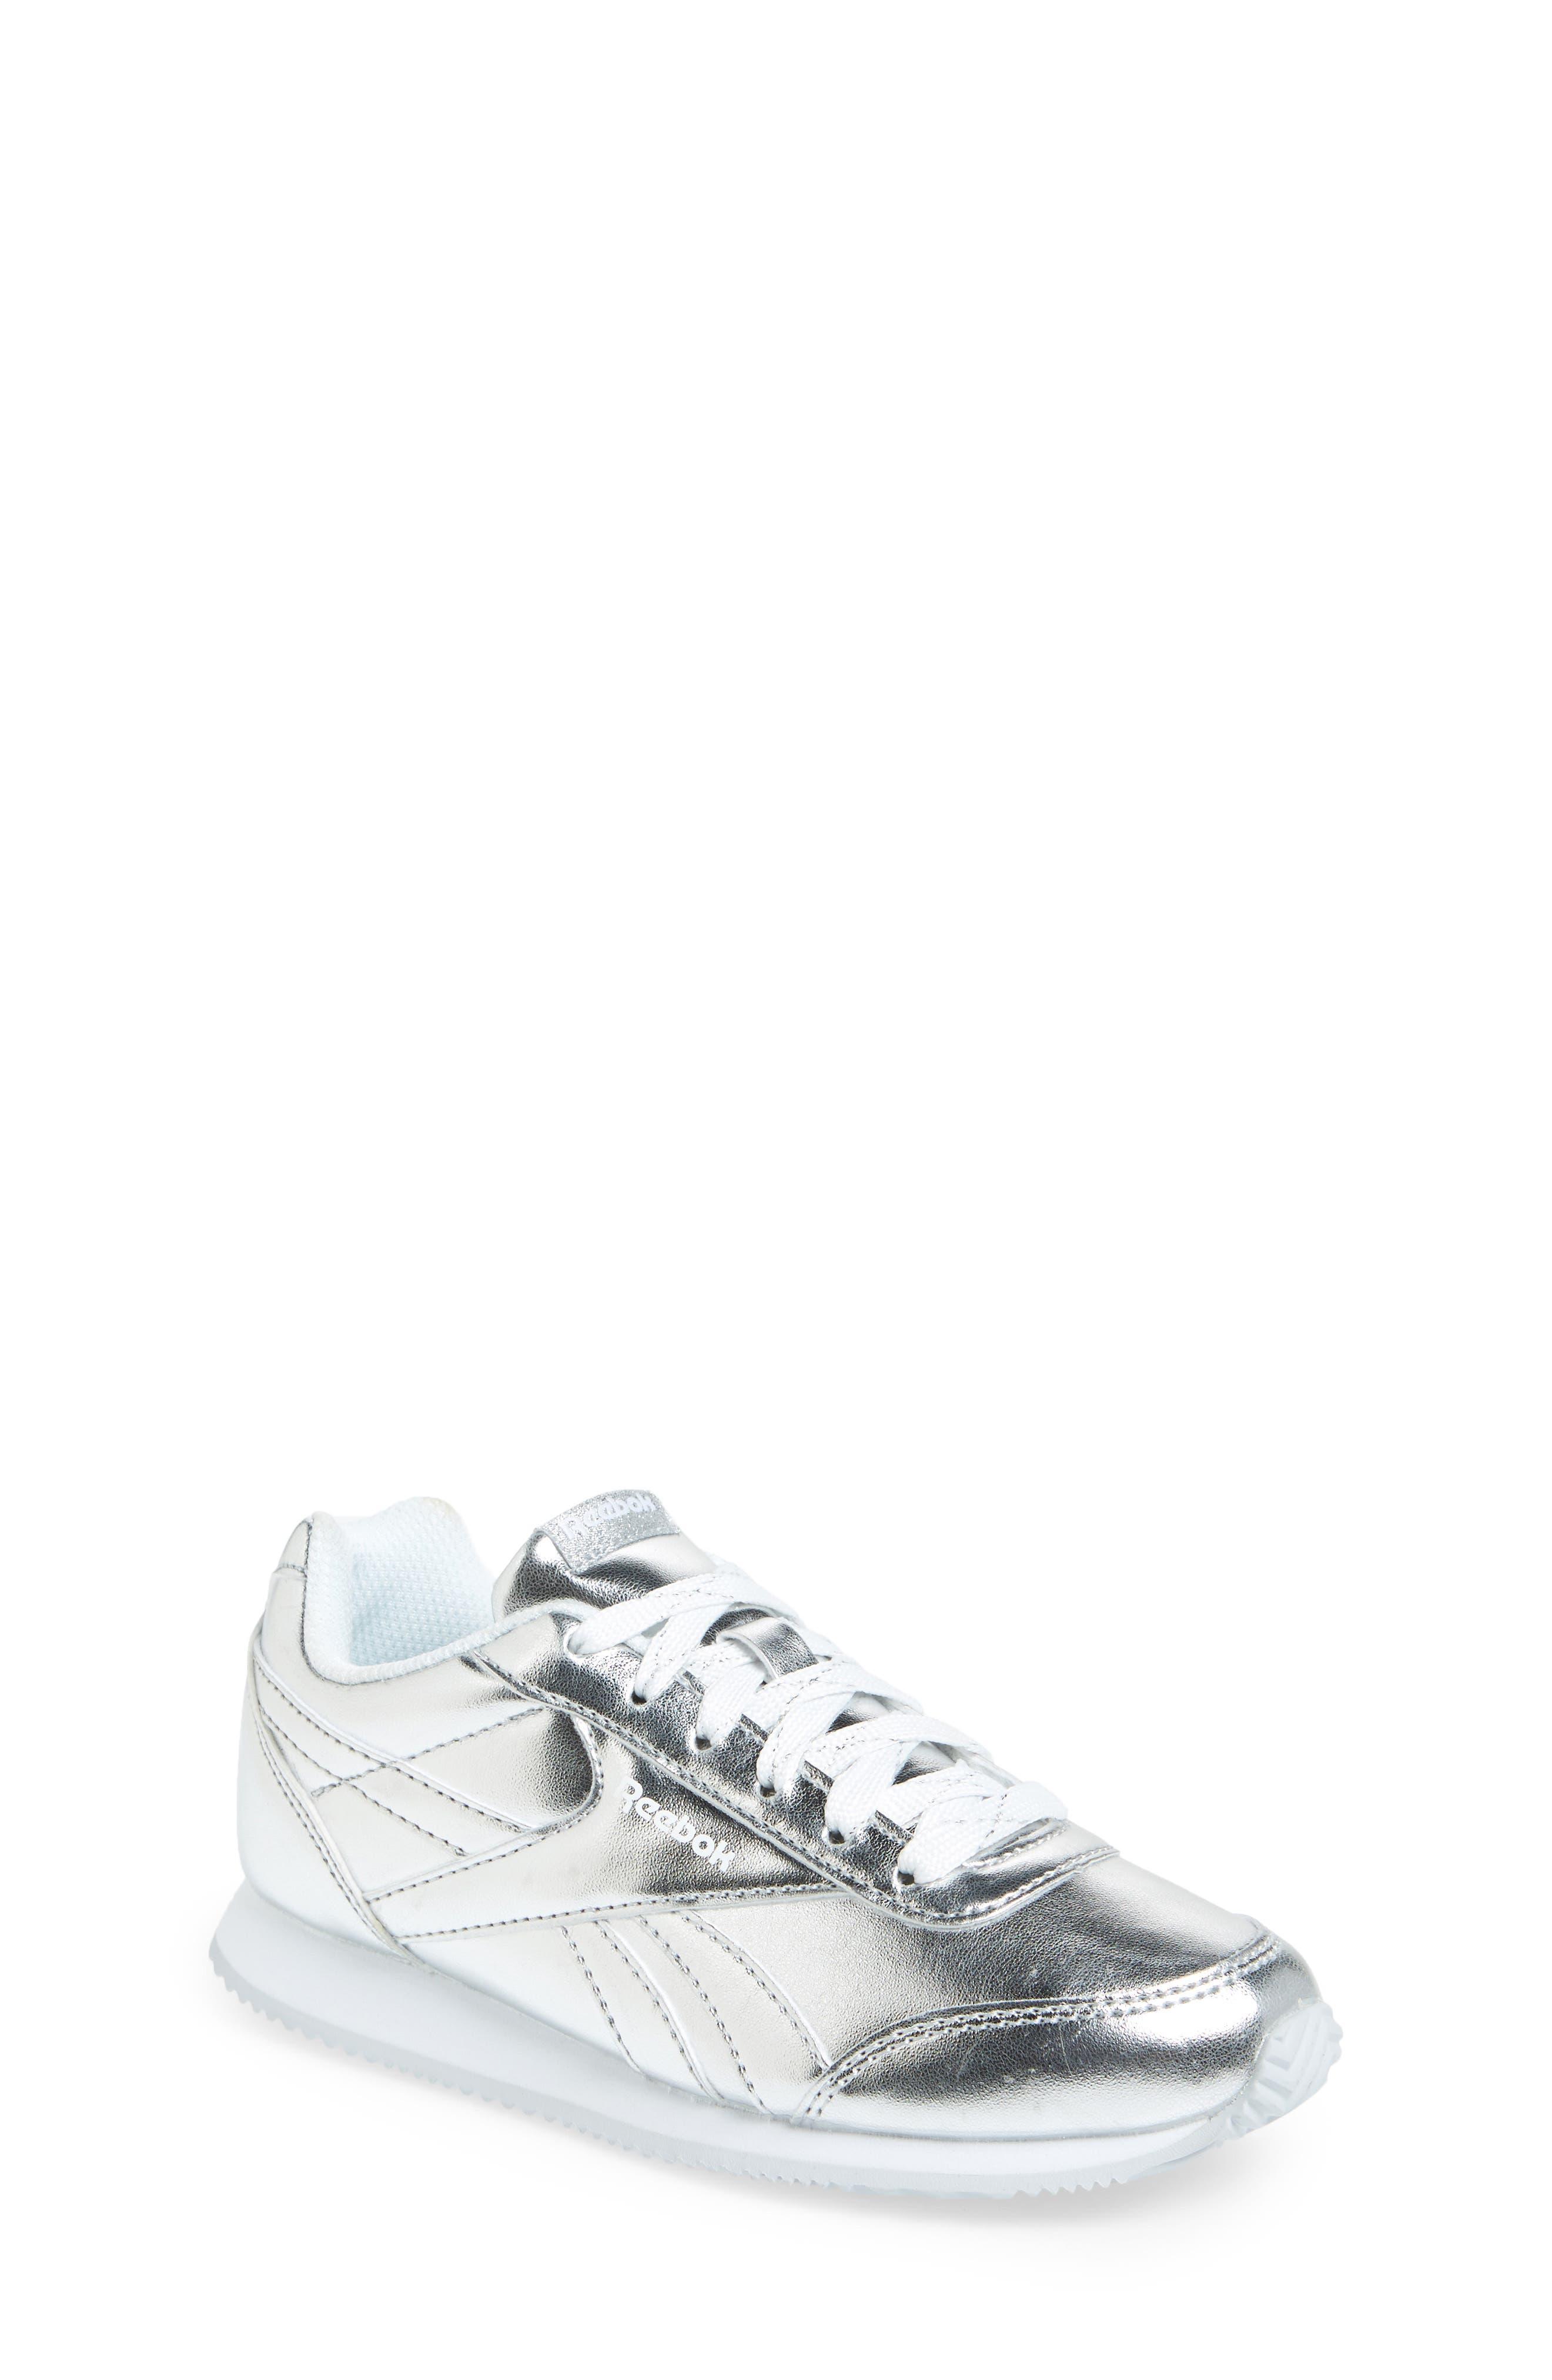 Royal Classic Jogger 2.0 Sneaker,                         Main,                         color, 040